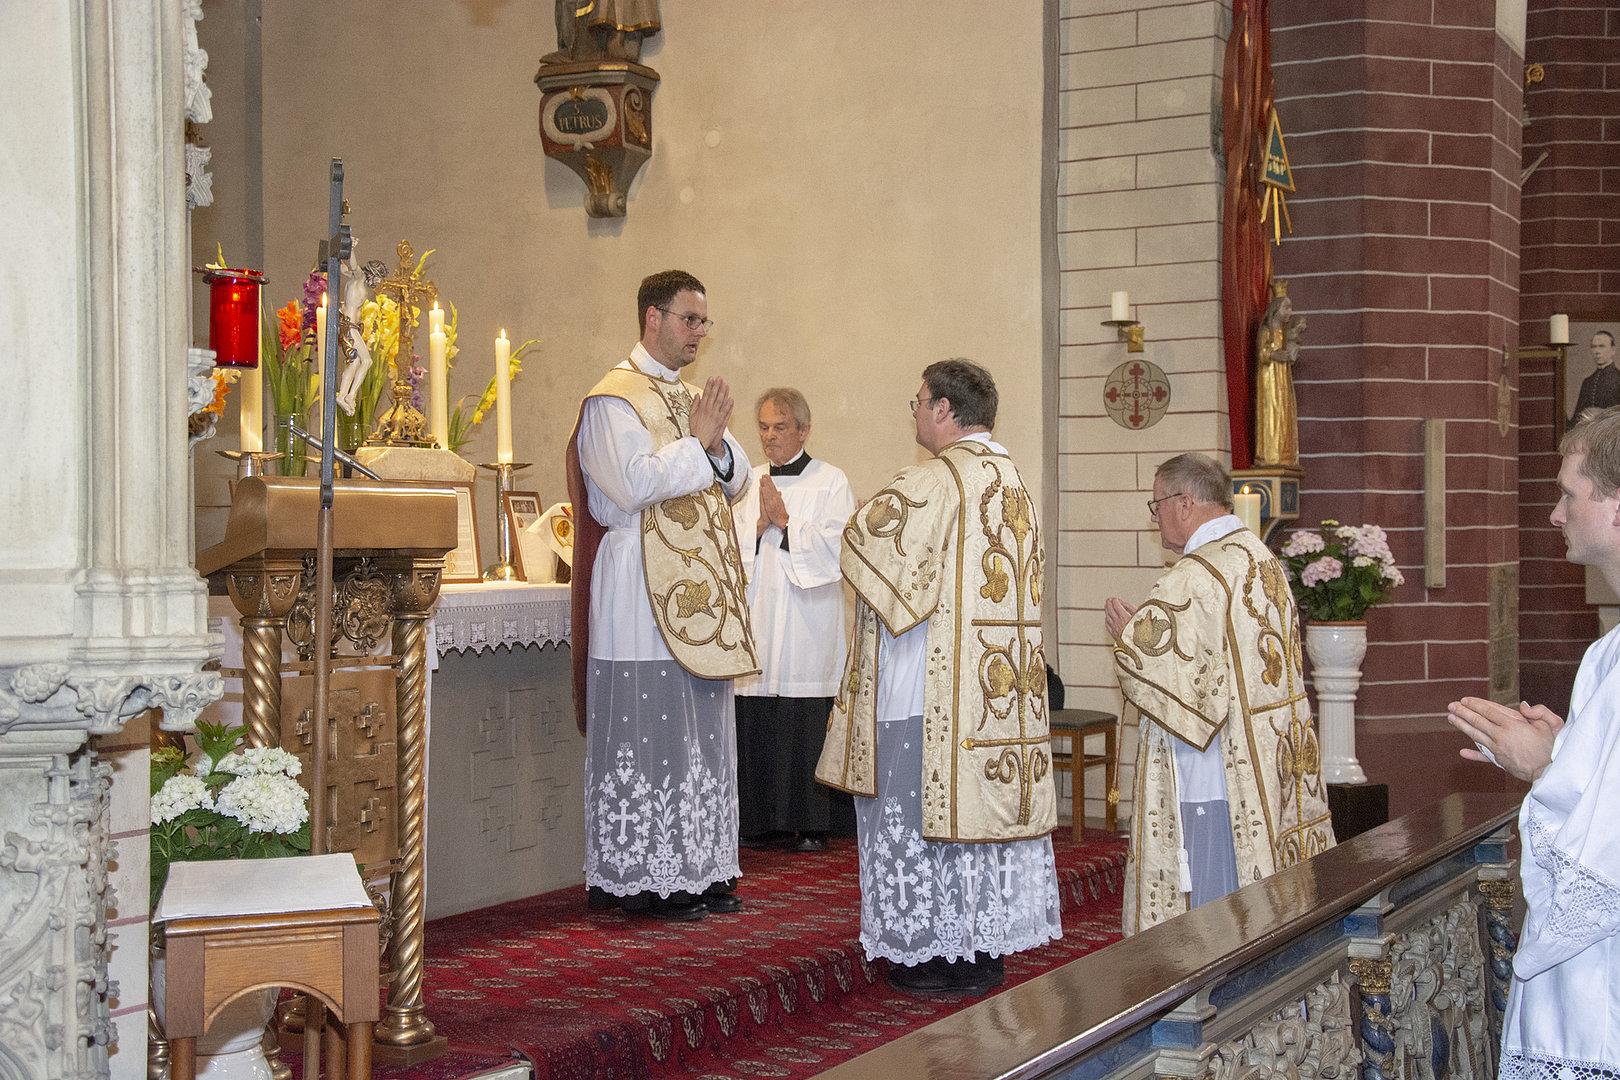 Solemn High Mass in Paderborn